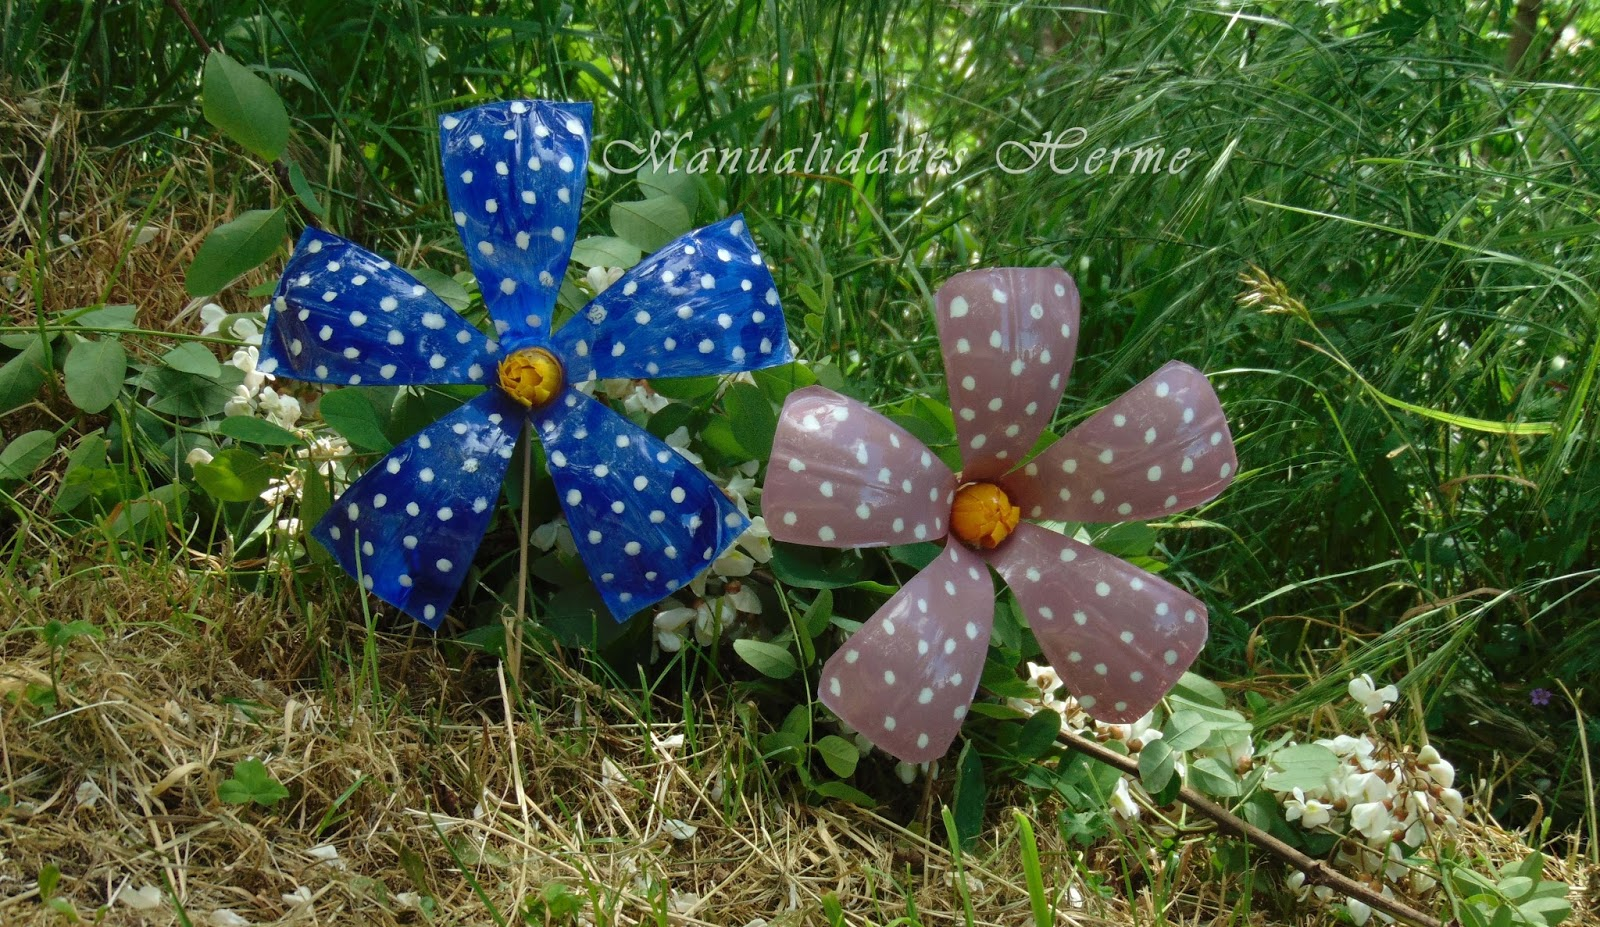 Manualidades herme como hacer flores con botellas for Adornos para decorar un jardin